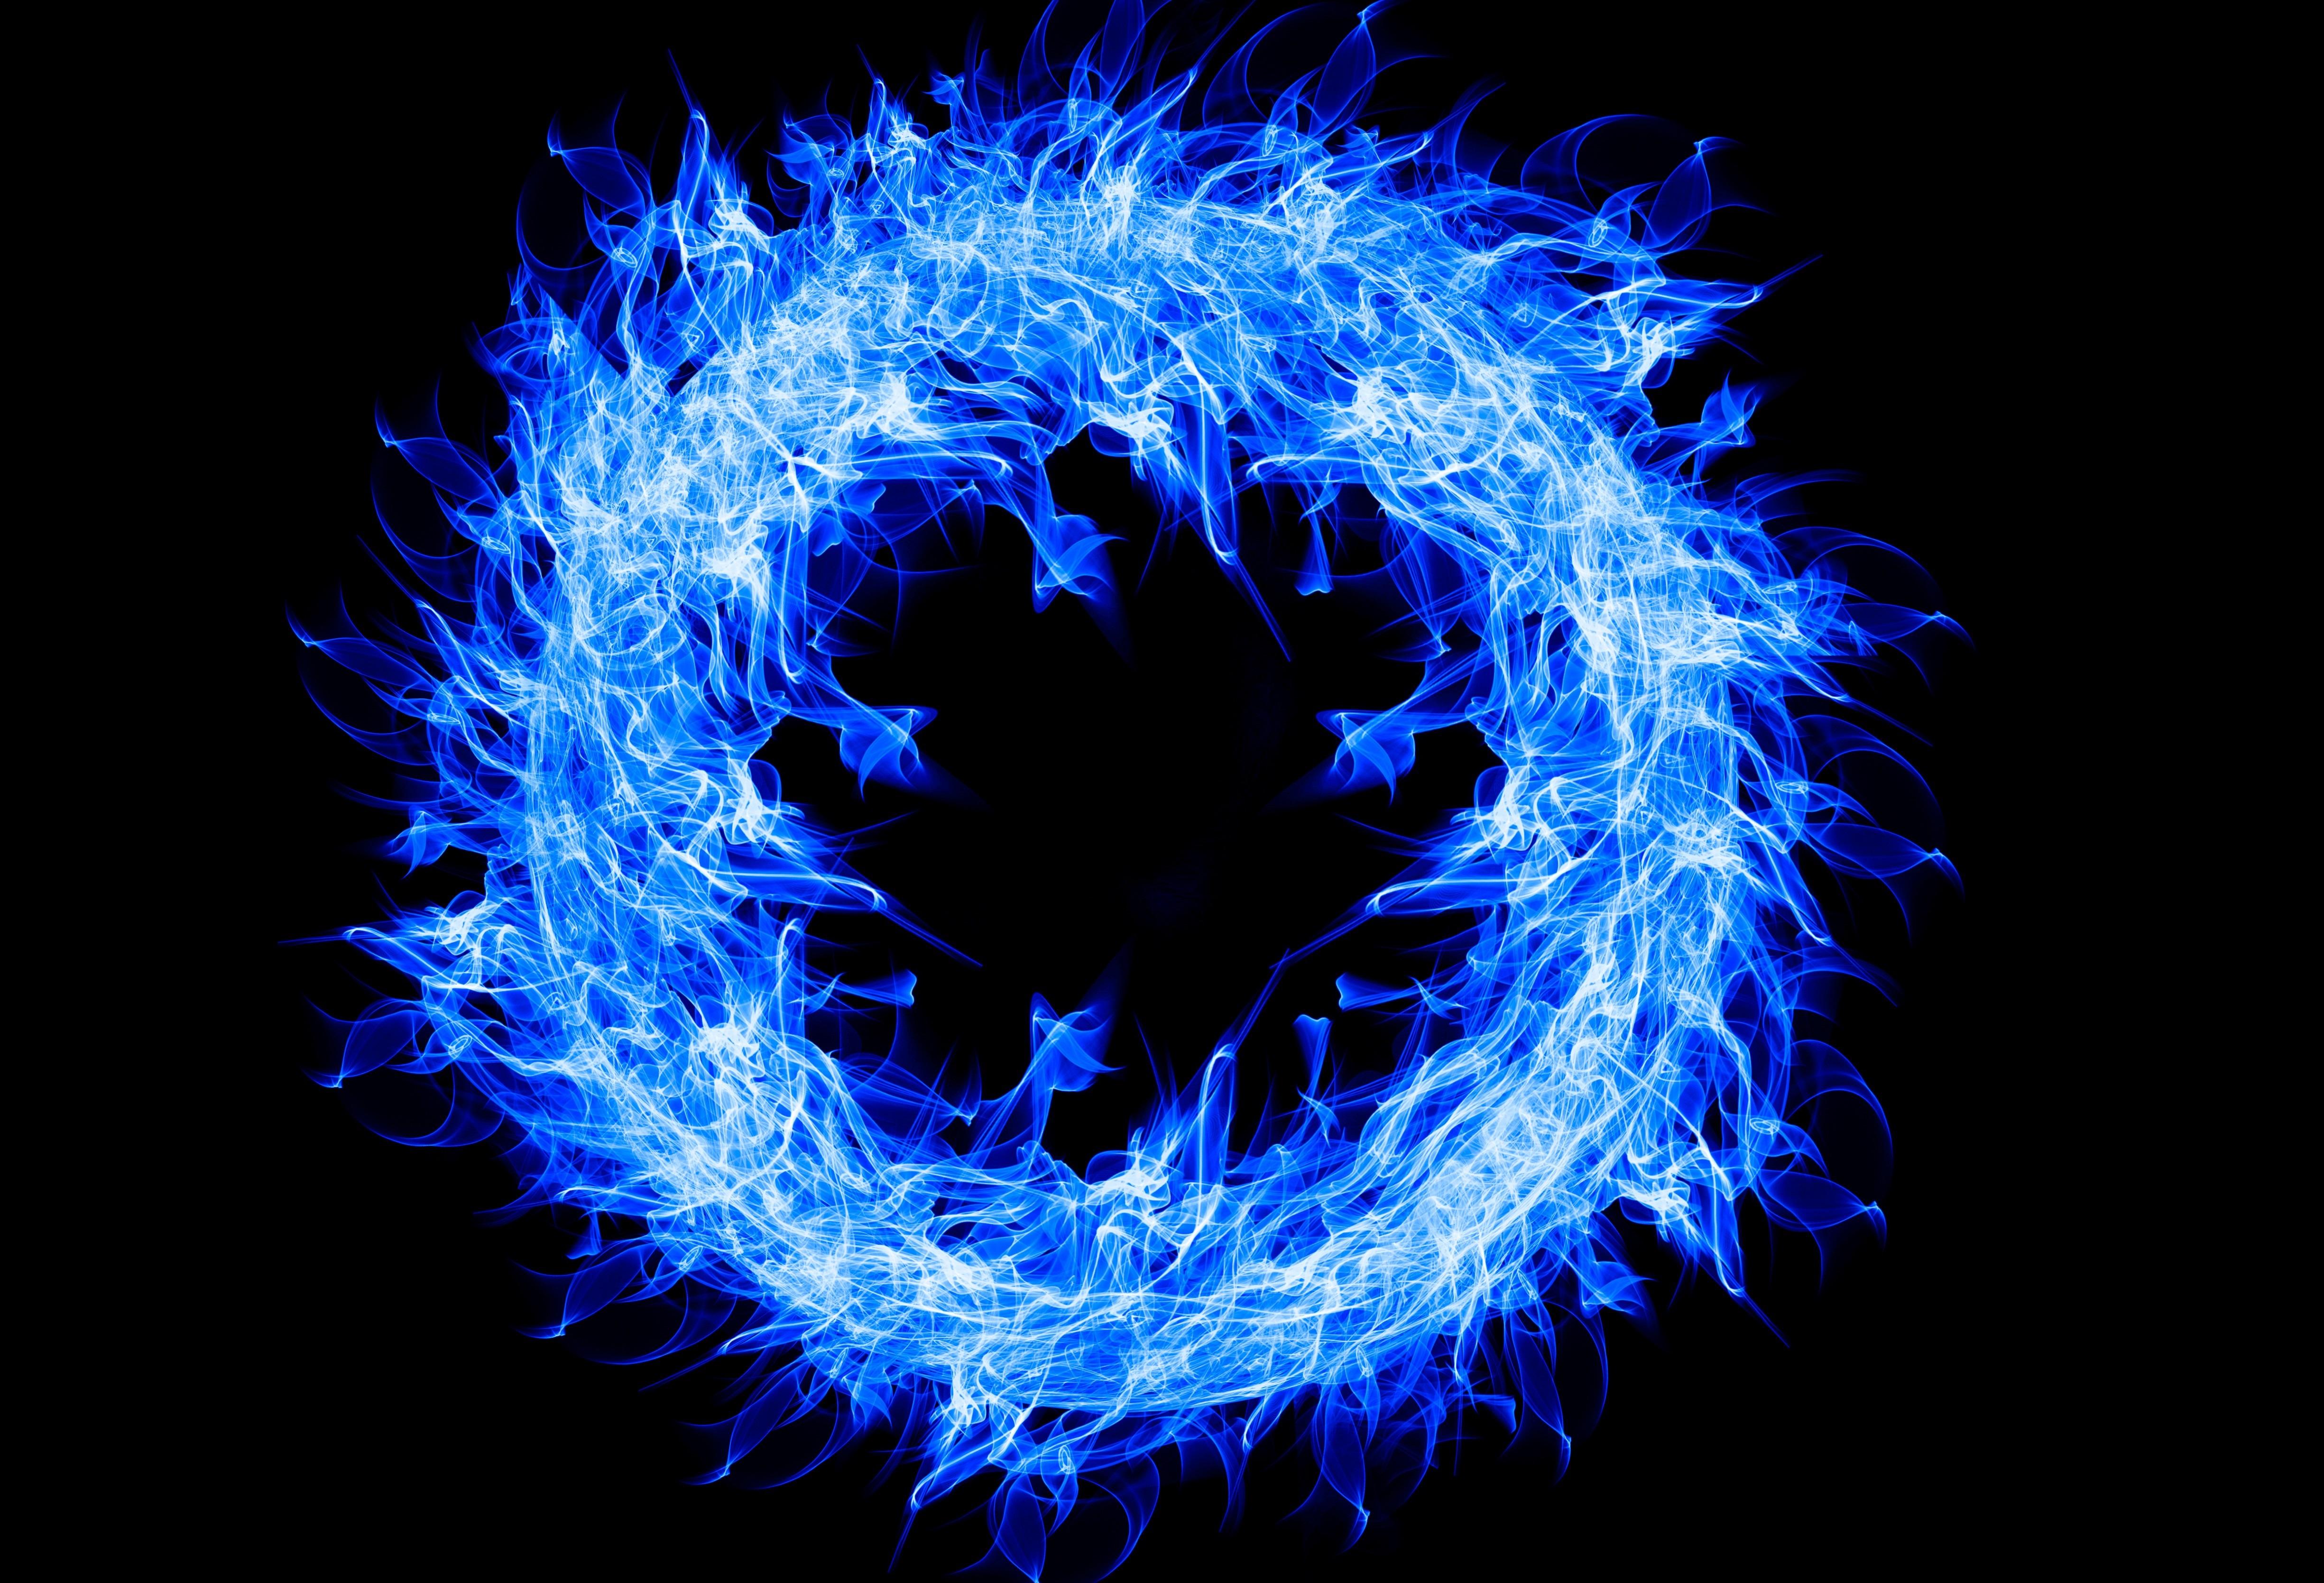 Blue Fire Ring 4k